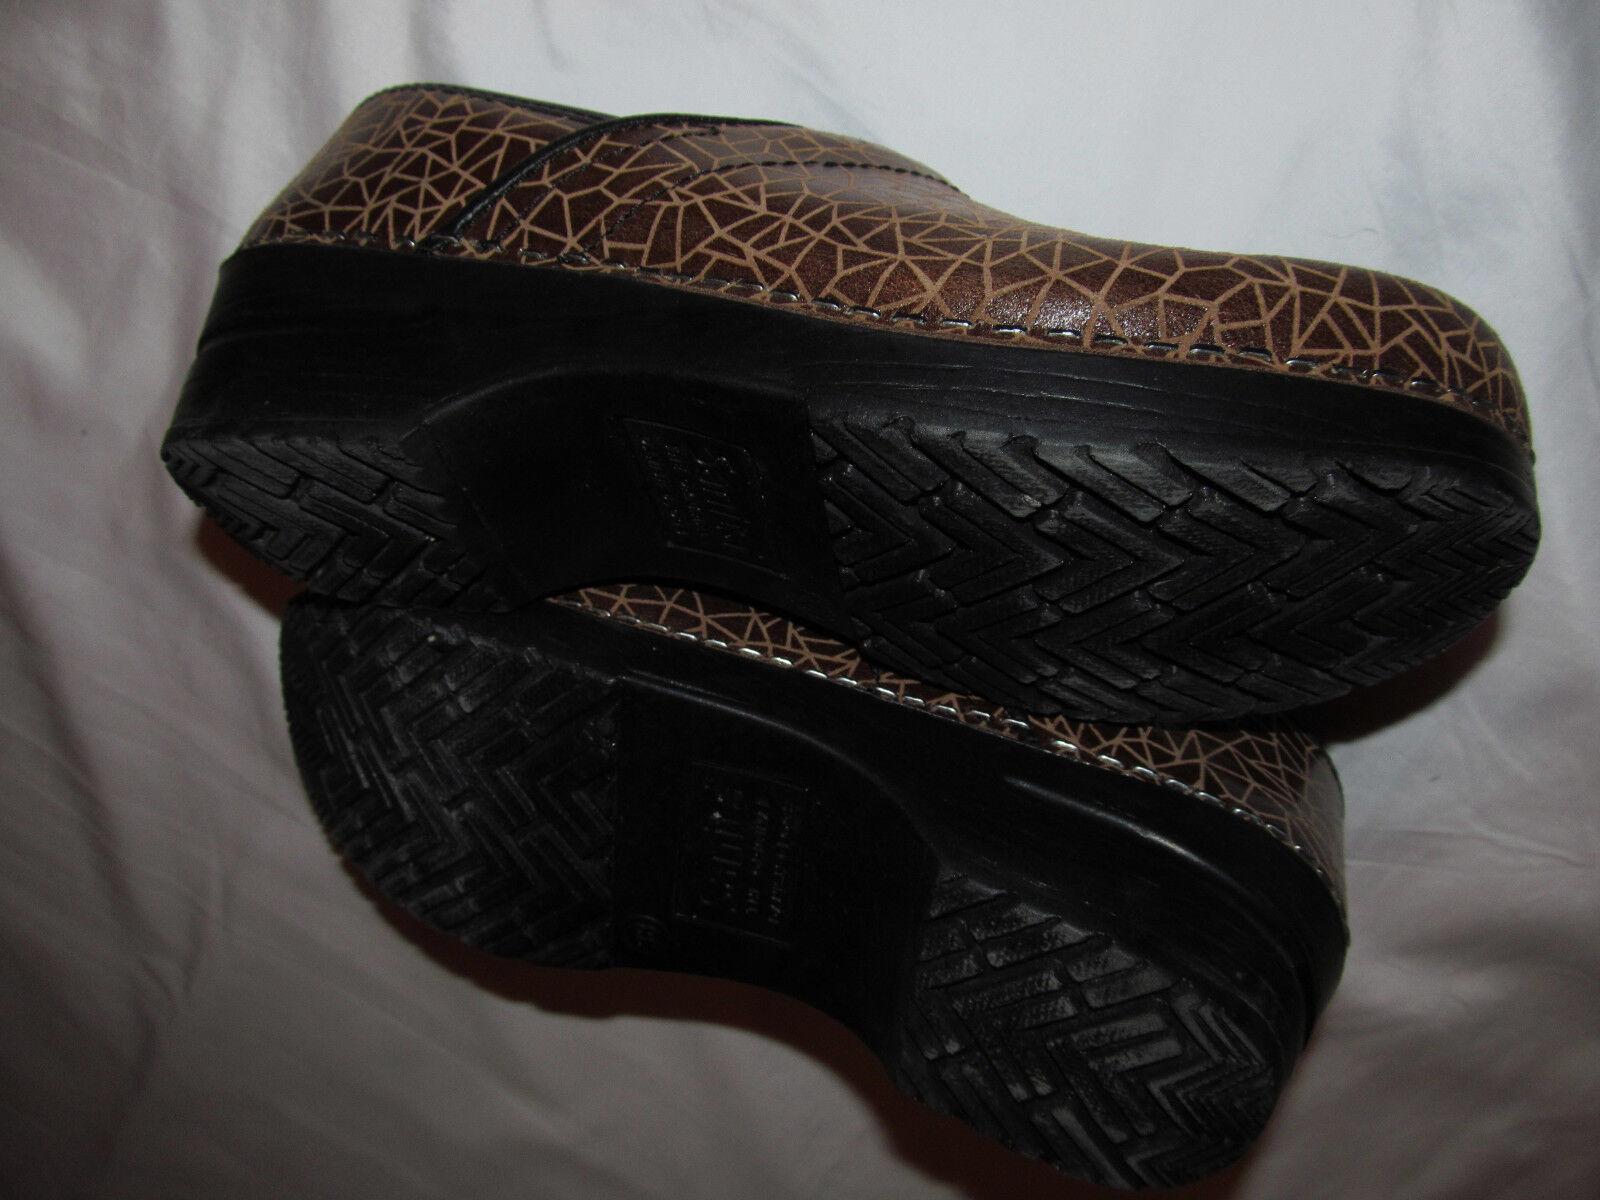 SANITA PRO texturot geometric geometric geometric giraffe polished leather clogs schuhe 38 7.5 m aef1ff